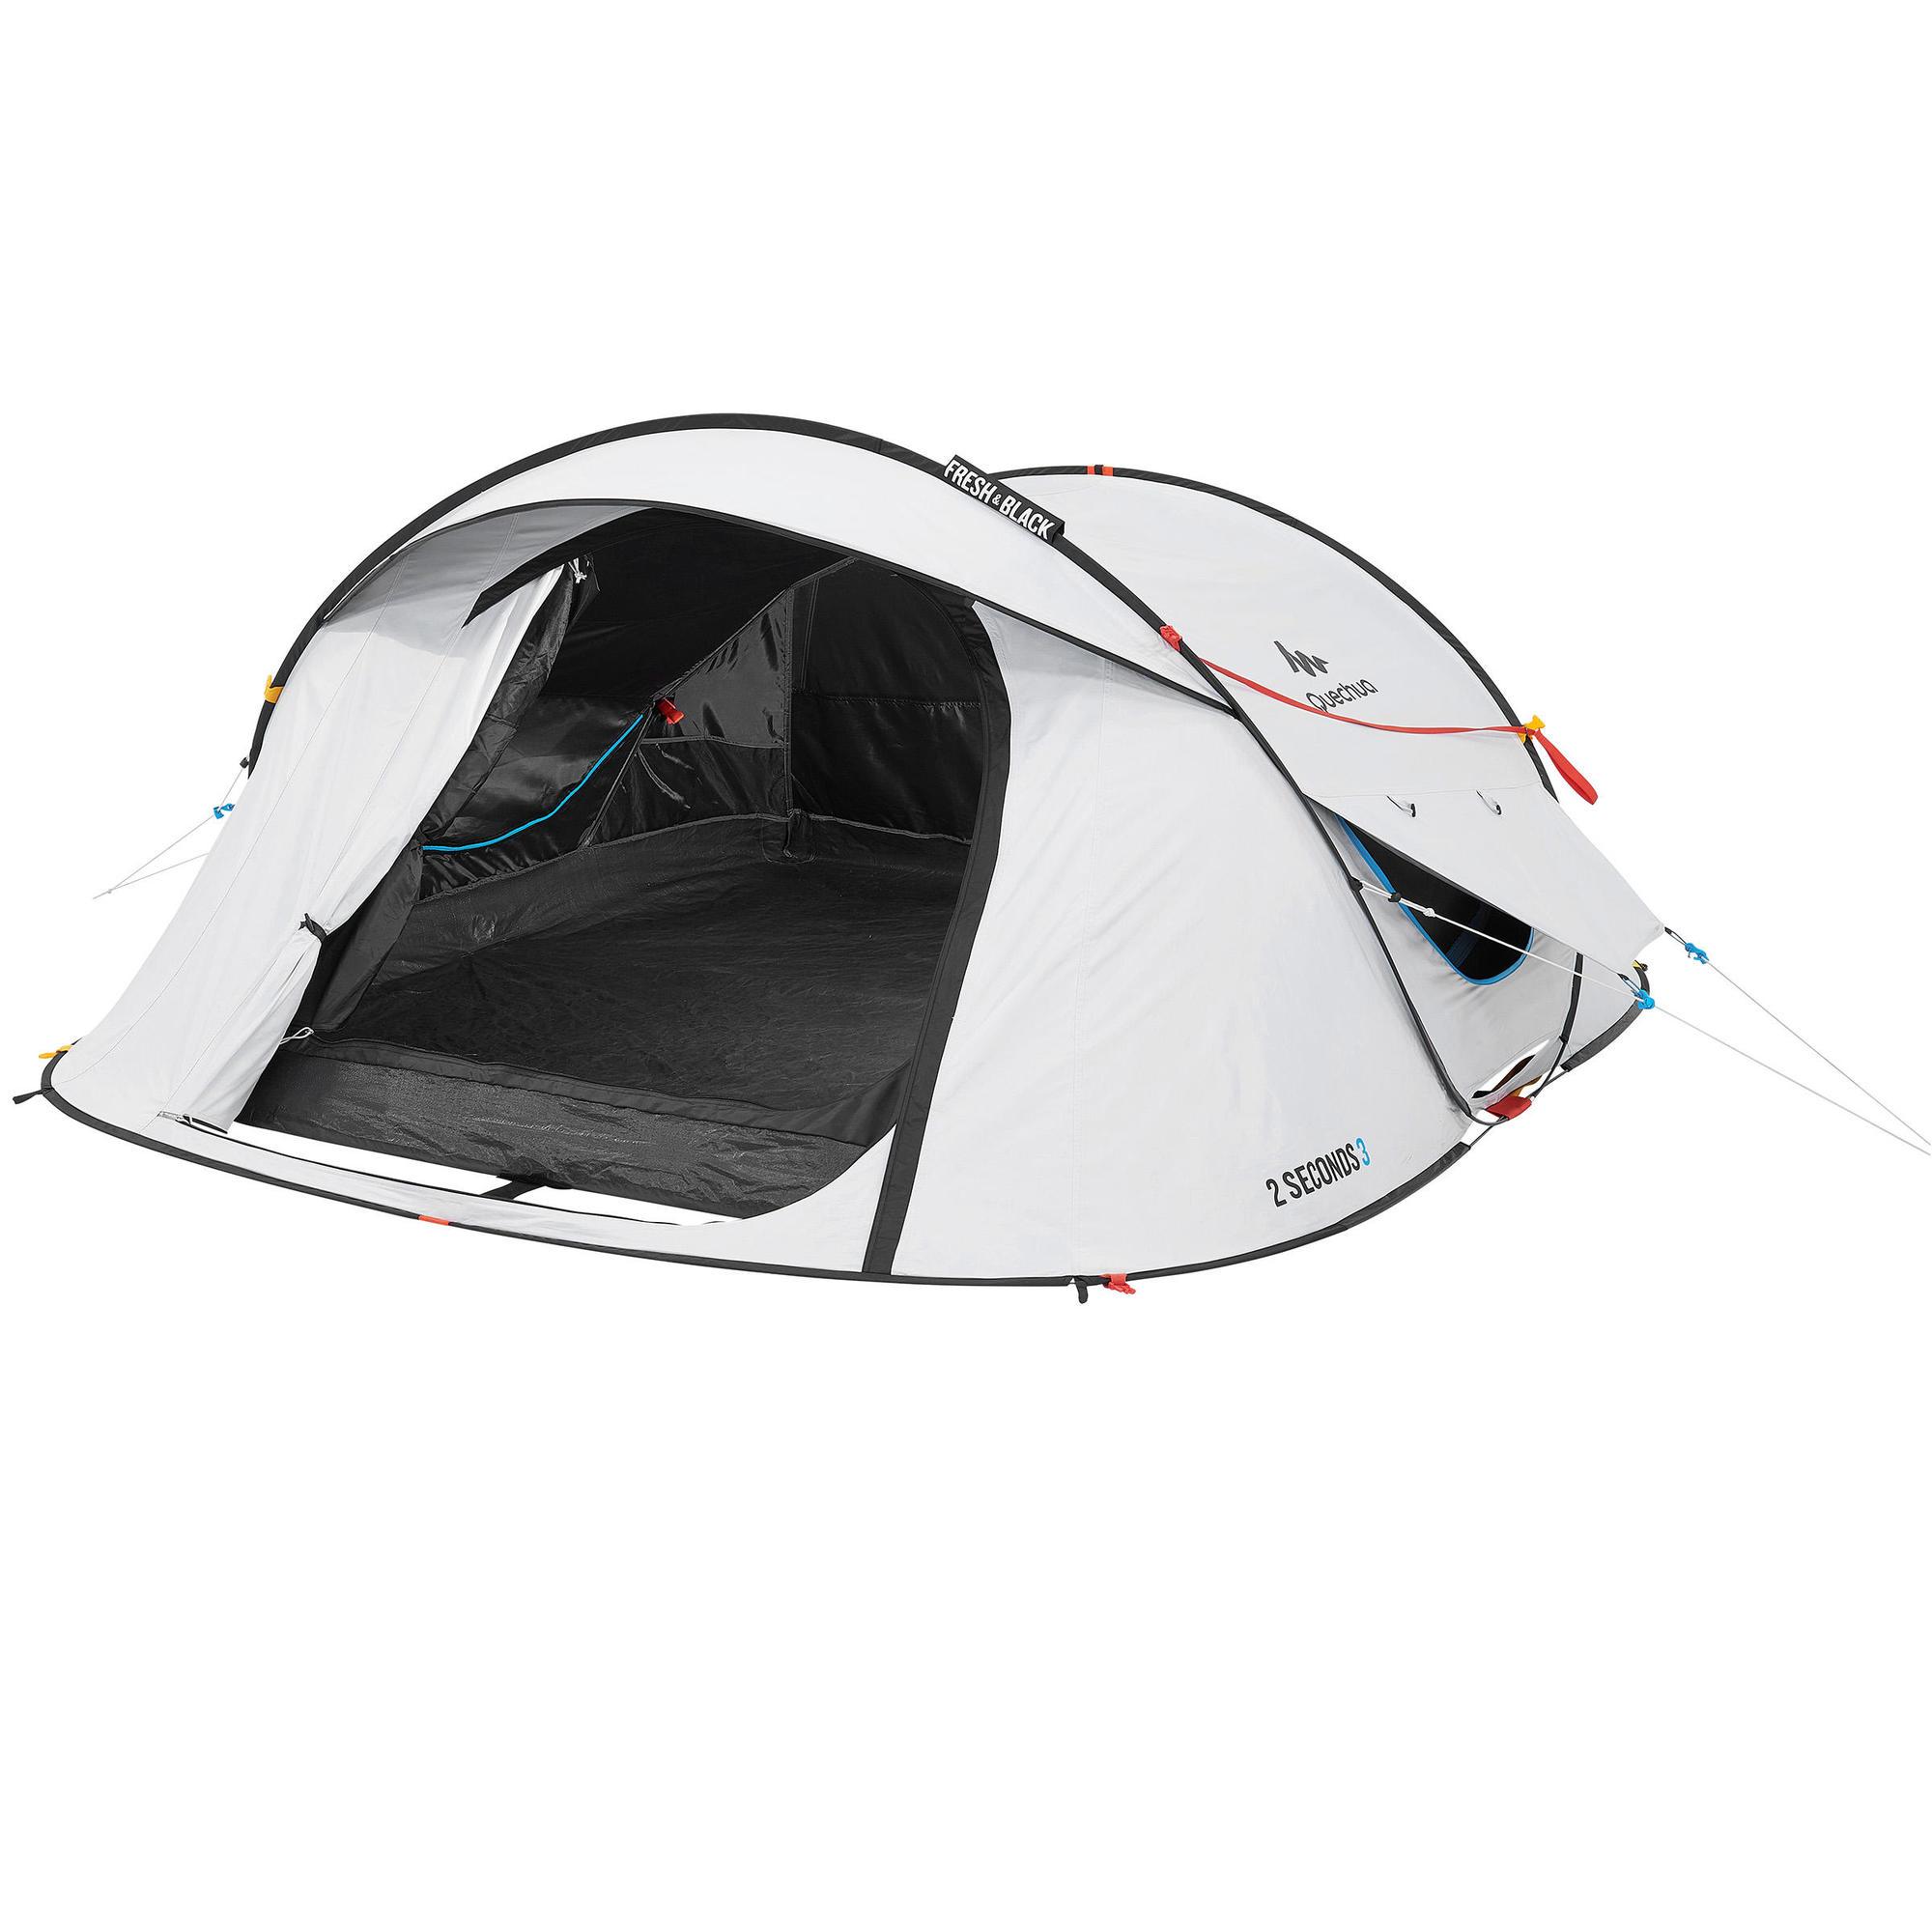 sc 1 st  Quechua & 2 Seconds Freshu0026Black 3 Person Camping Tent - White | Quechua